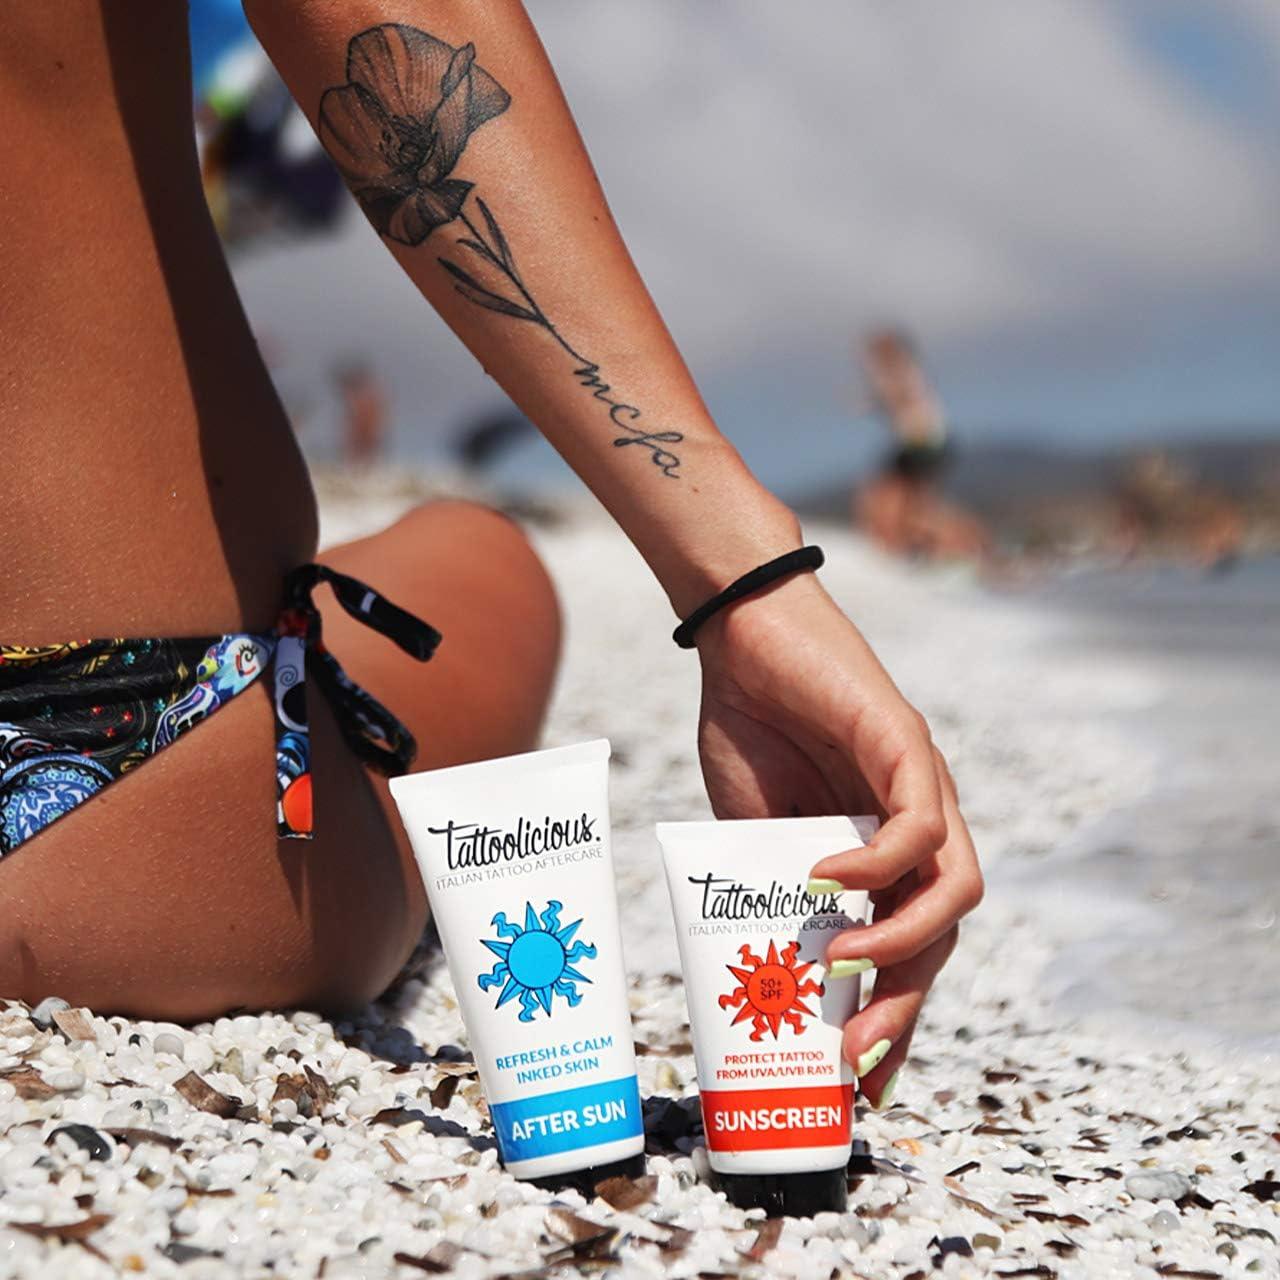 Tattoolicious COMBO SUN - SUNSCREEN 50+SPF Crema solar para ...